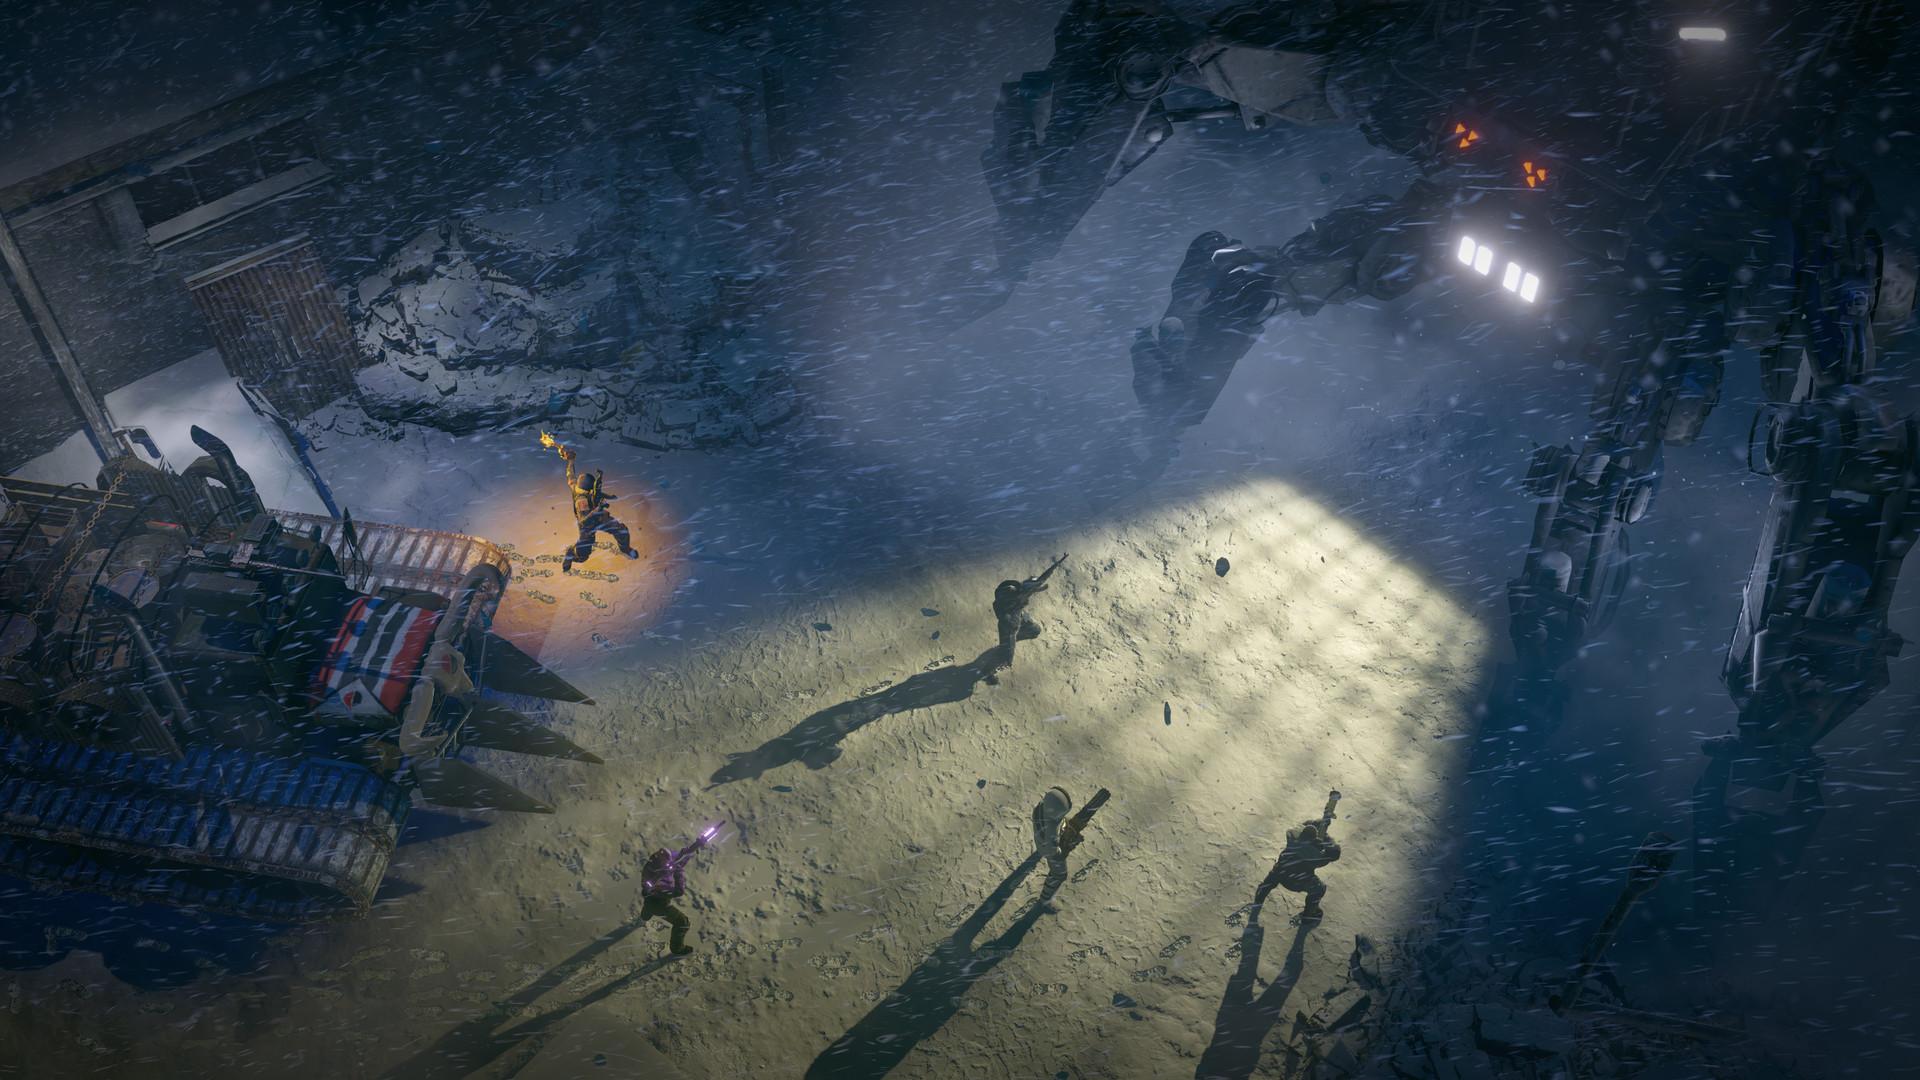 Pre-purchase Wasteland 3 on Steam